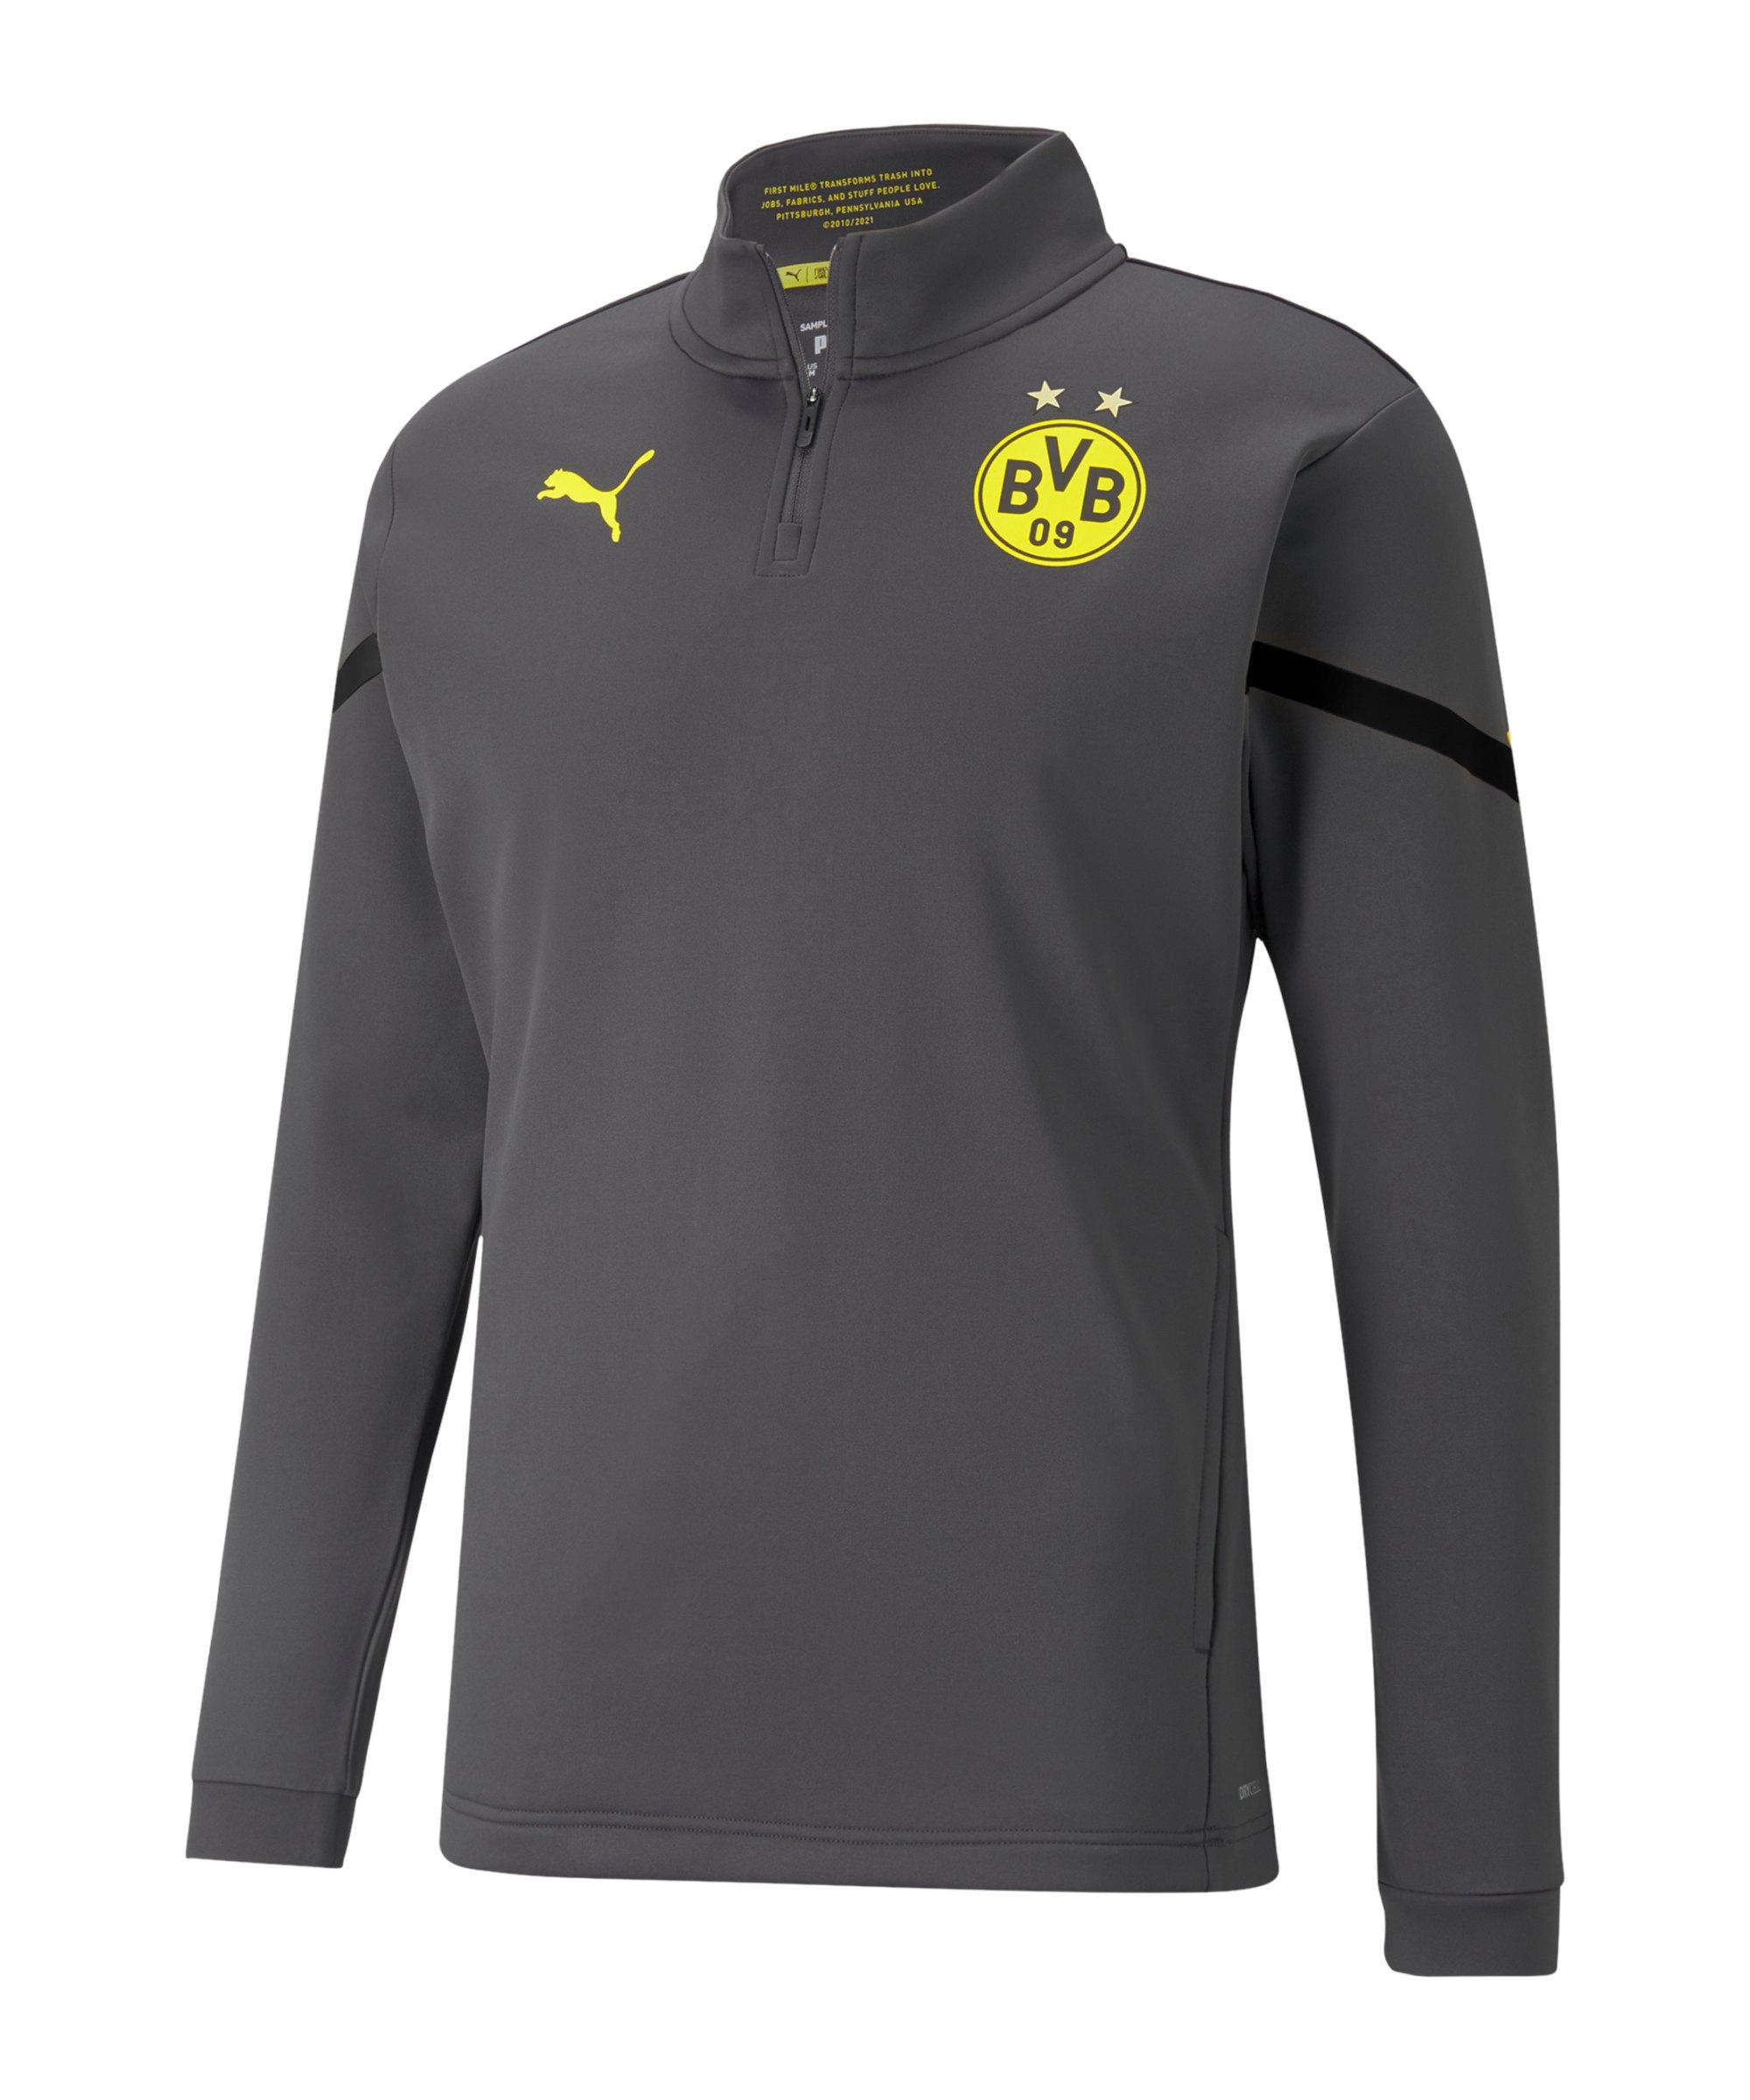 PUMA BVB Dortmund Prematch 1/4 Ziptop 2021/2022 Grau F04 - grau